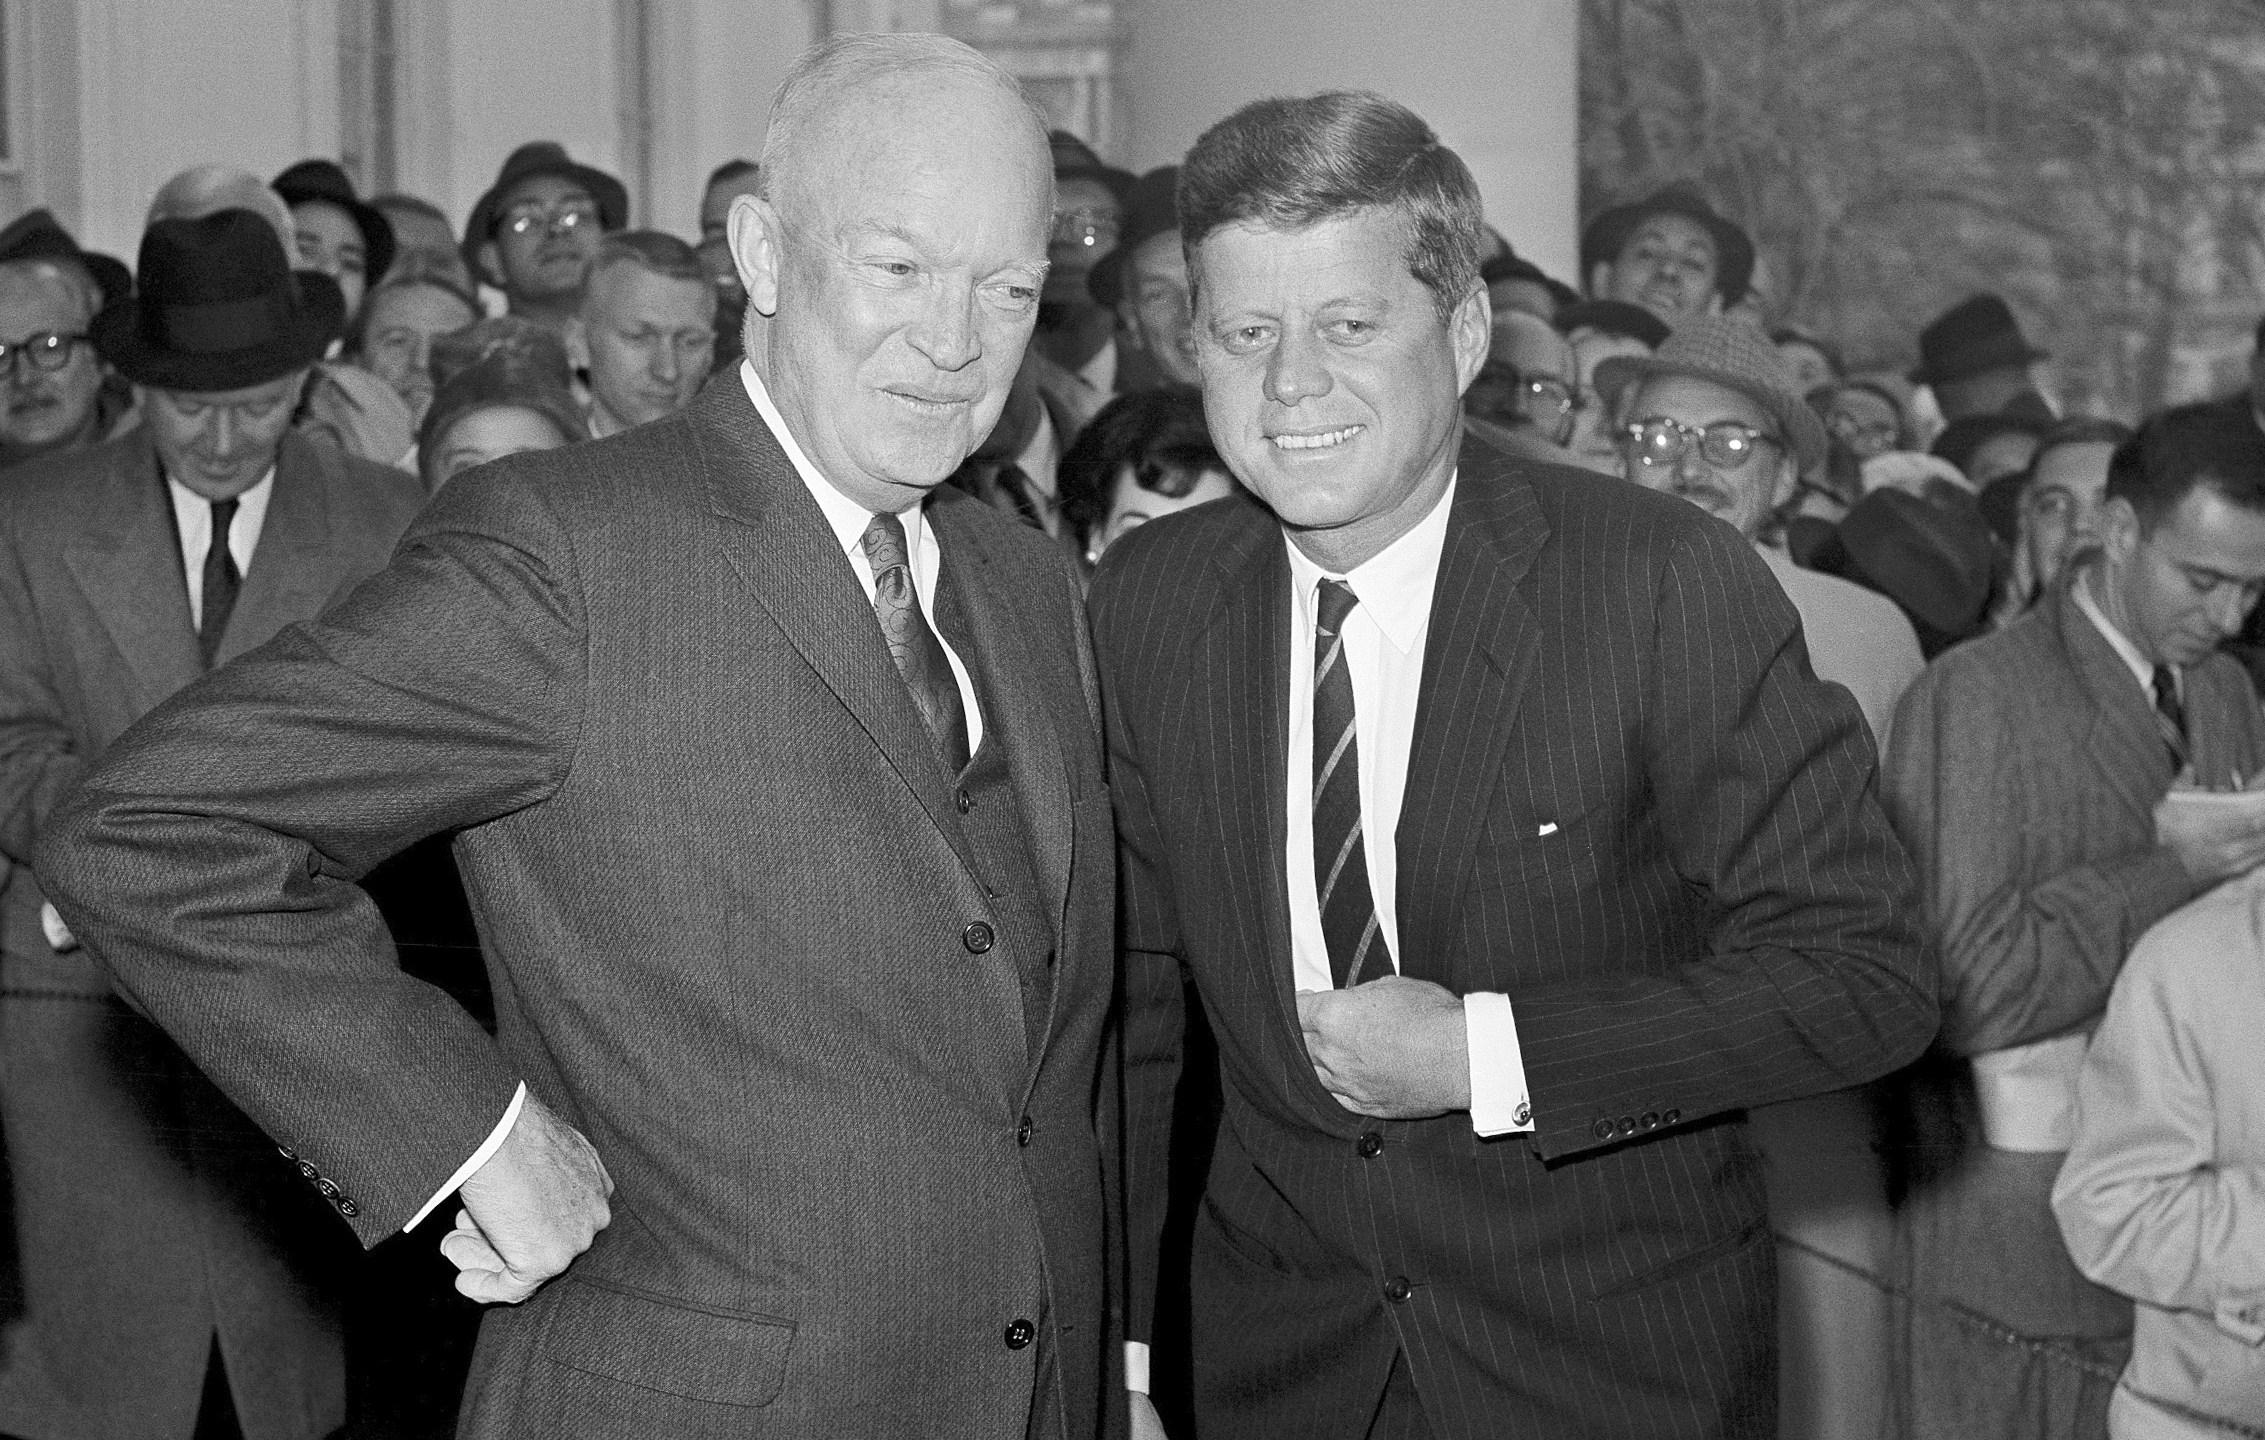 Dwight Eisnehower, John Kennedy, Dwight Eisenhower, John F. Kennedy